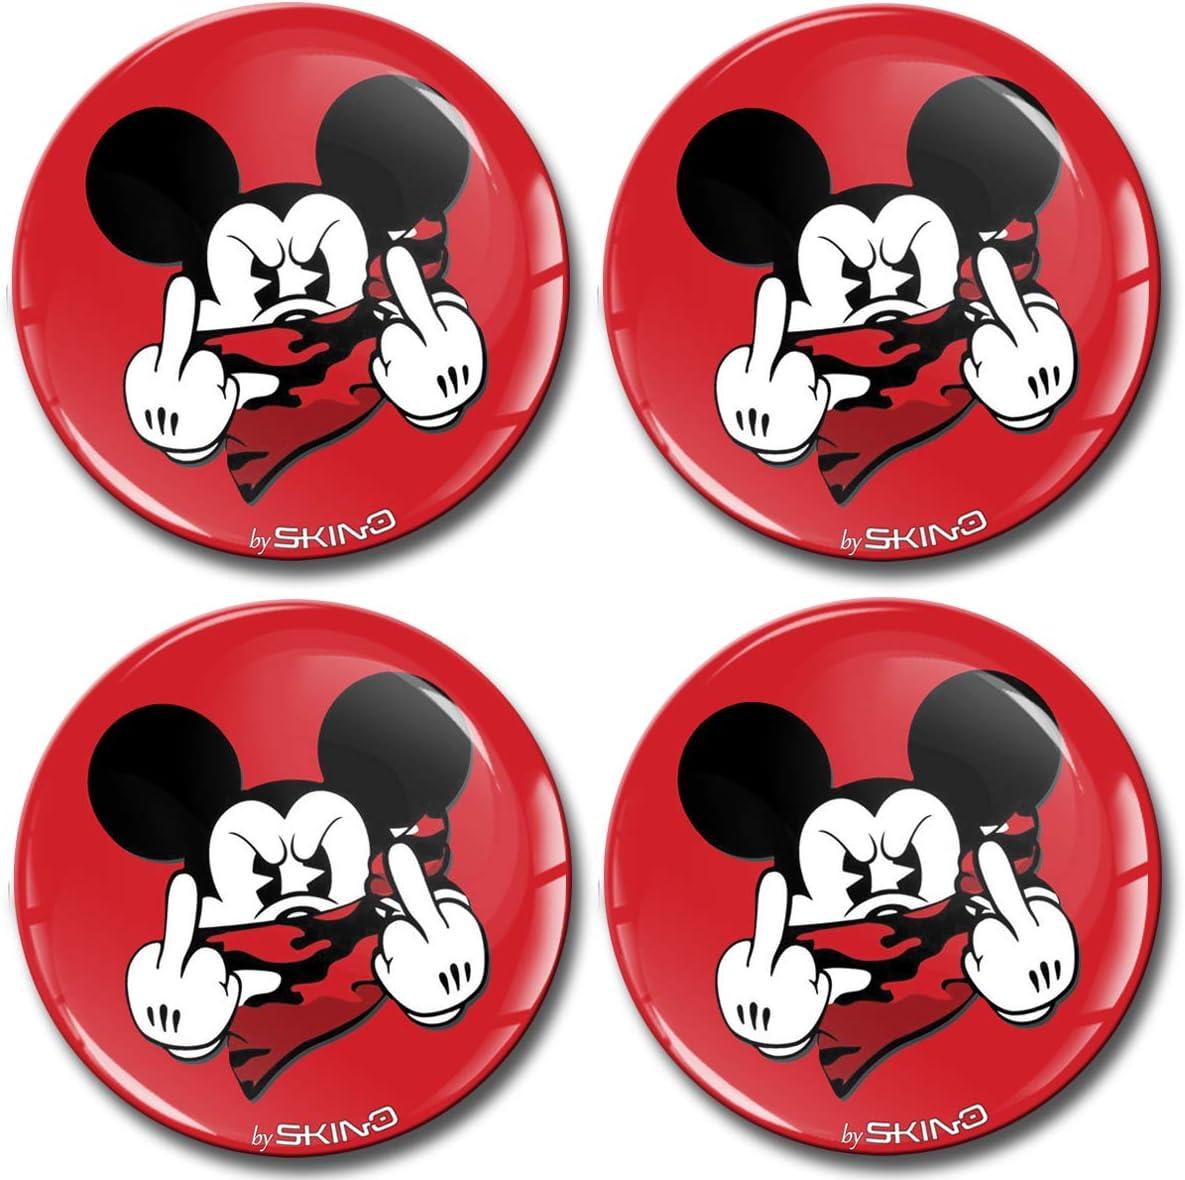 Skinoeu 4 X 55mm Aufkleber 3d Gel Silikon Autoaufkleber Stickers Maus Mouse Mittelfinger Felgenaufkleber Für Radkappen Nabenkappen Nabendeckel Auto Tuning Andere Größe A 3555 Auto